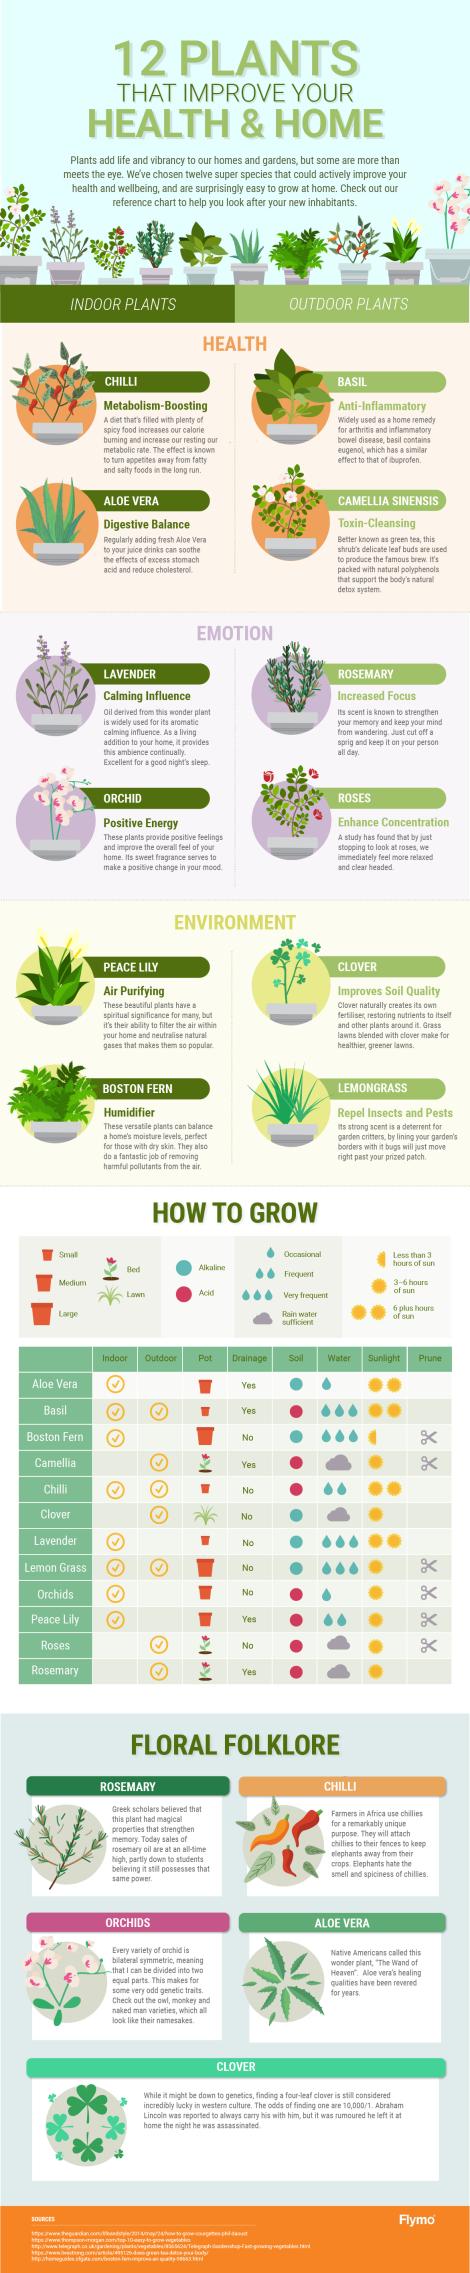 12-plants